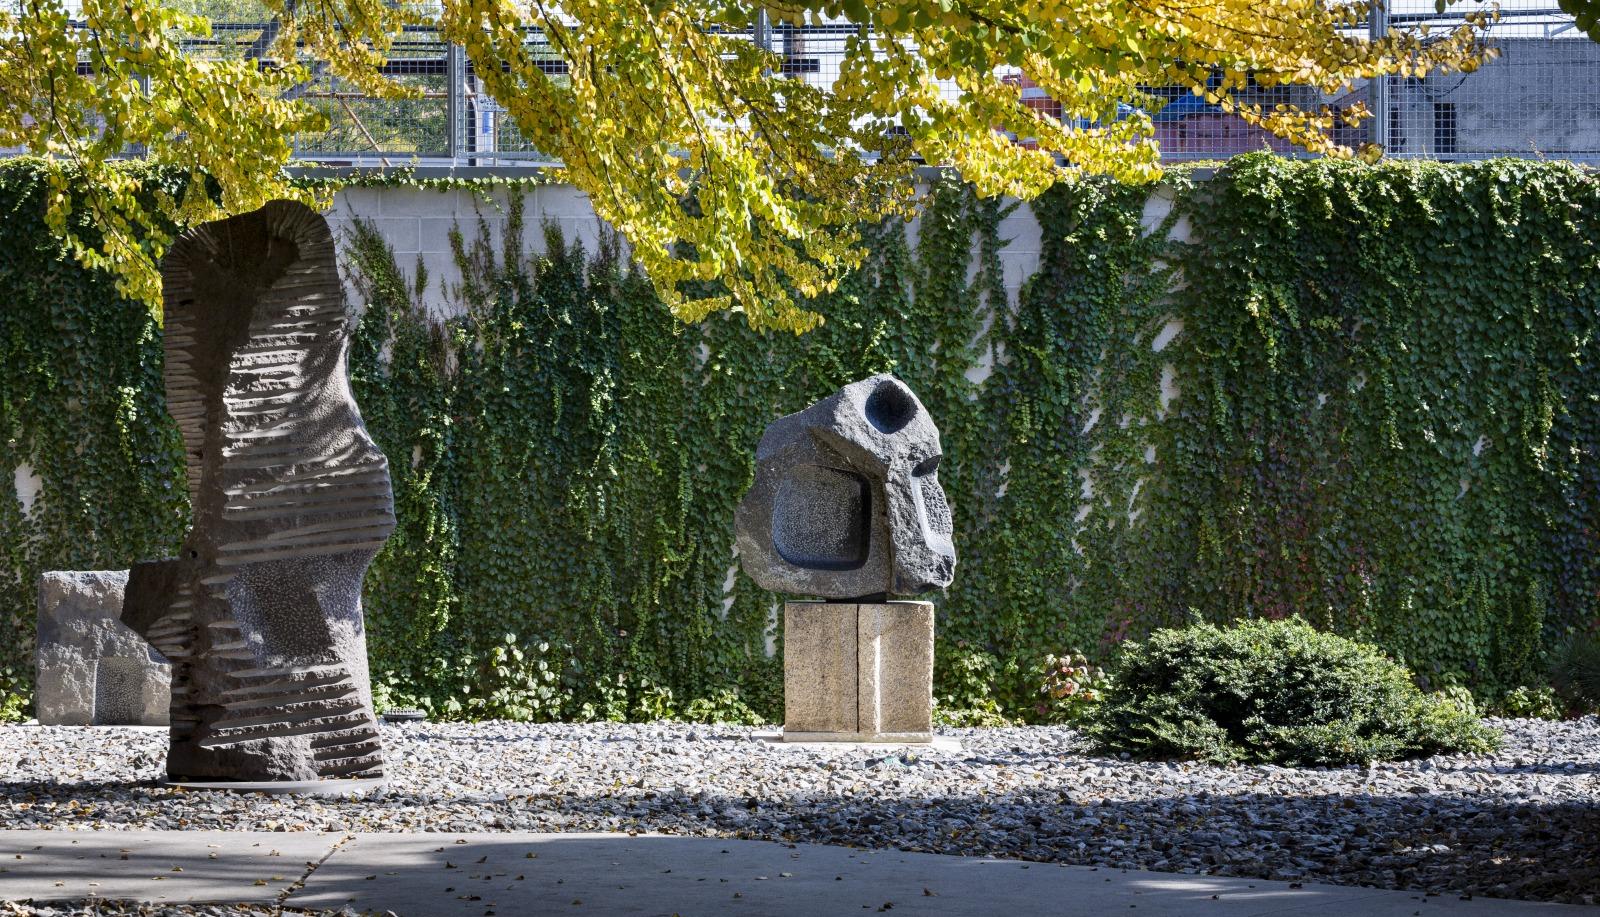 The gravel garden at The Noguchi Museum